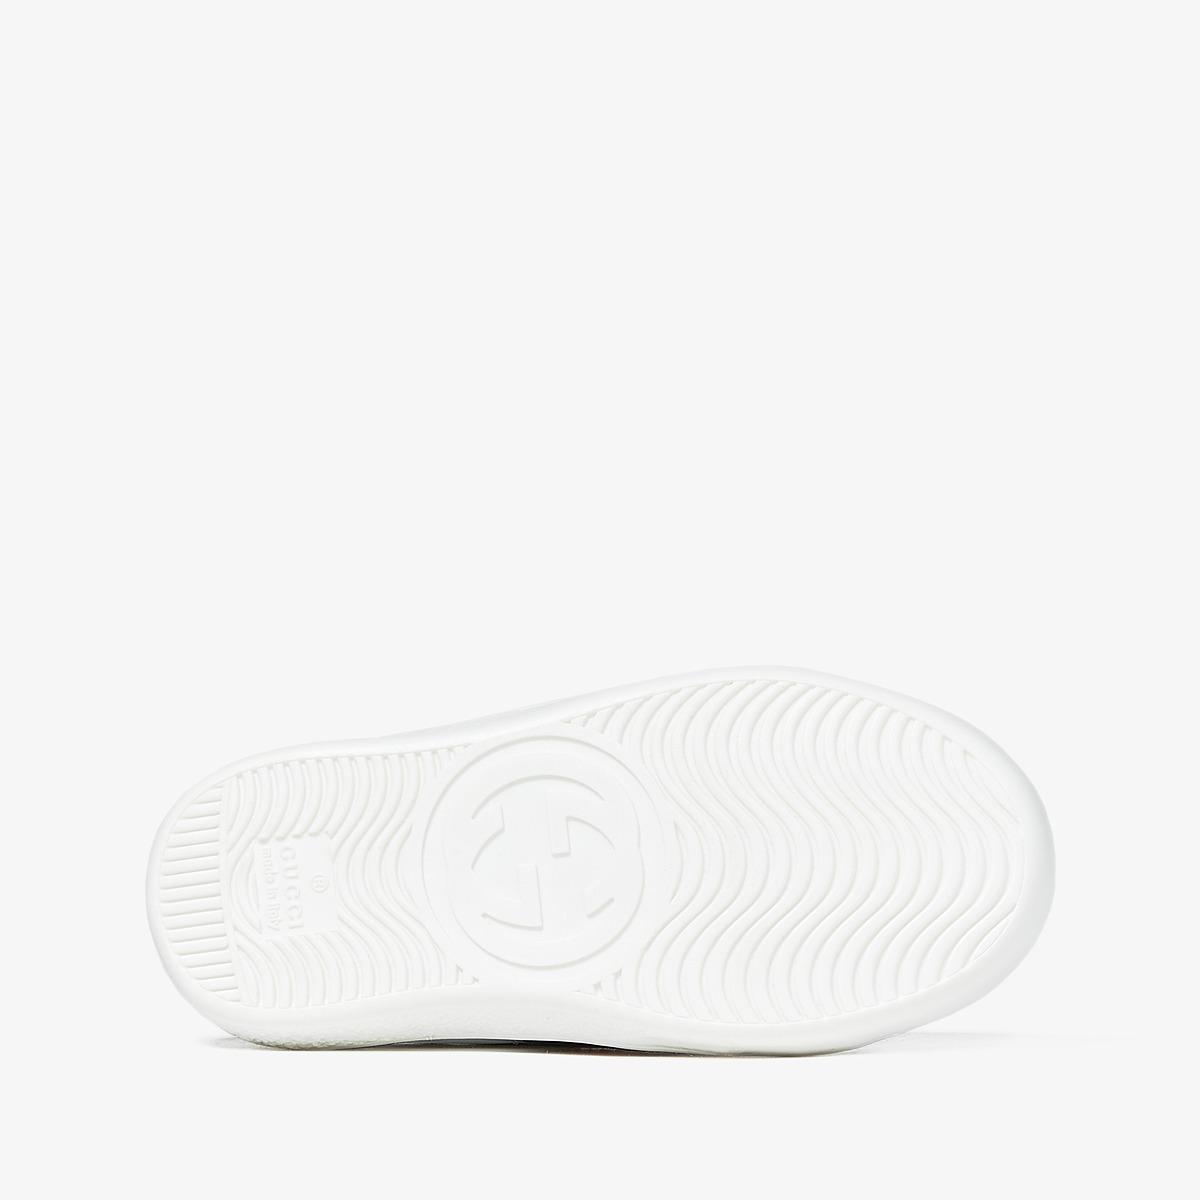 Kids Tennis Shoes Size